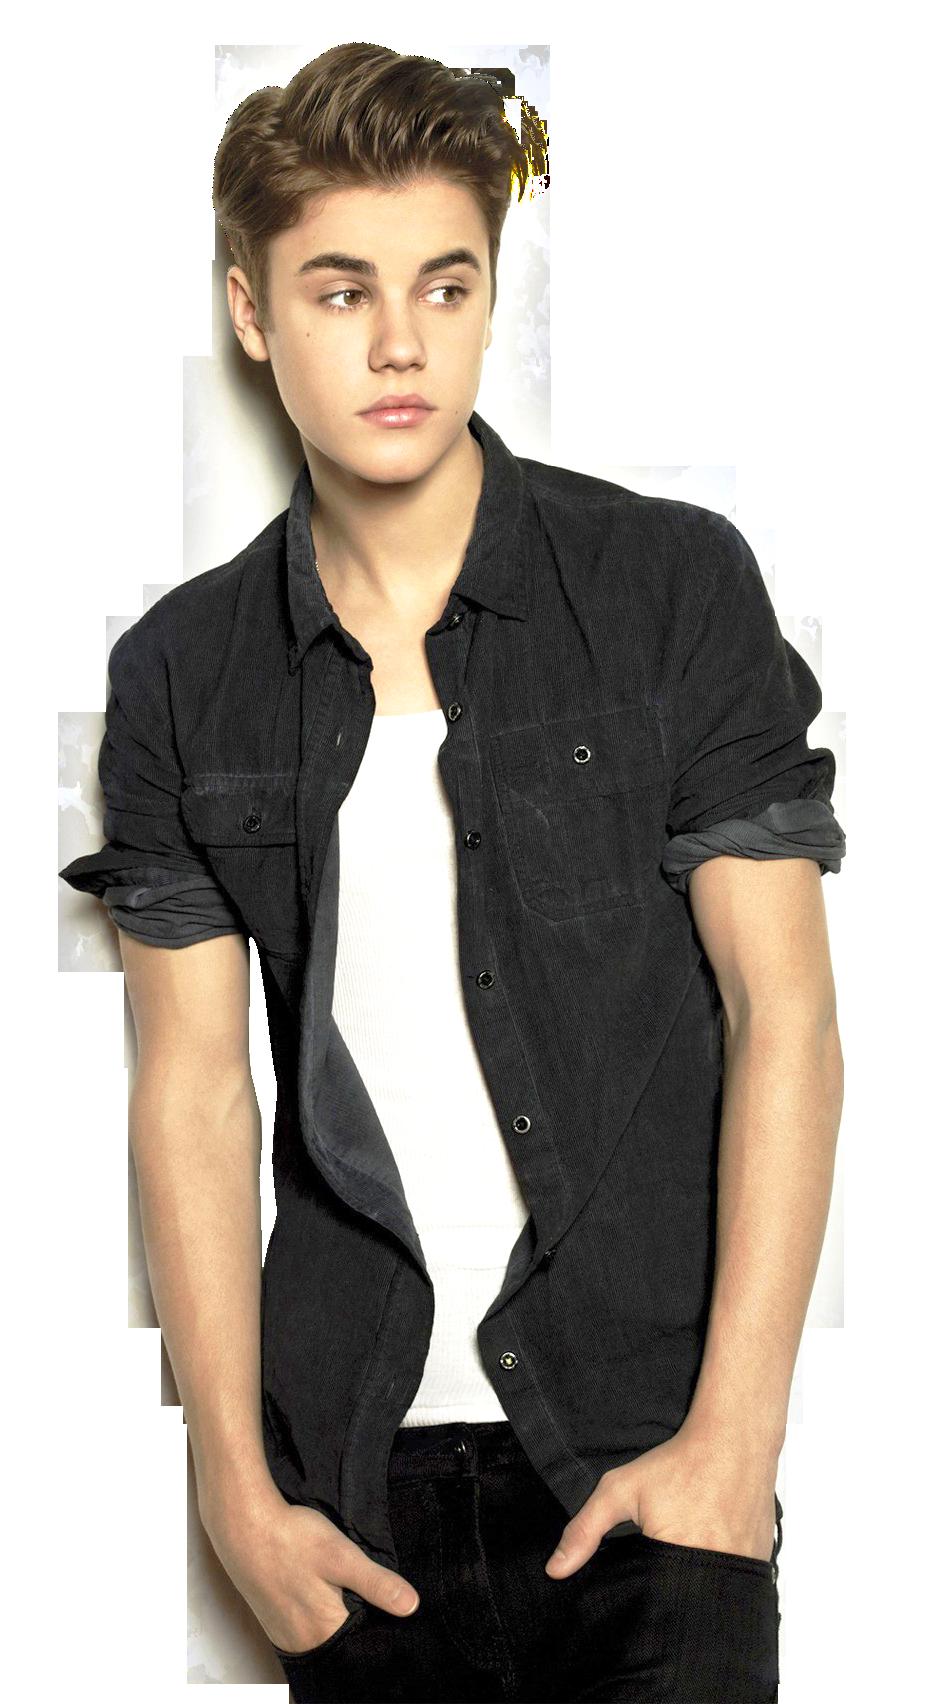 A Famous Singer Justin Bieber PNG Image.